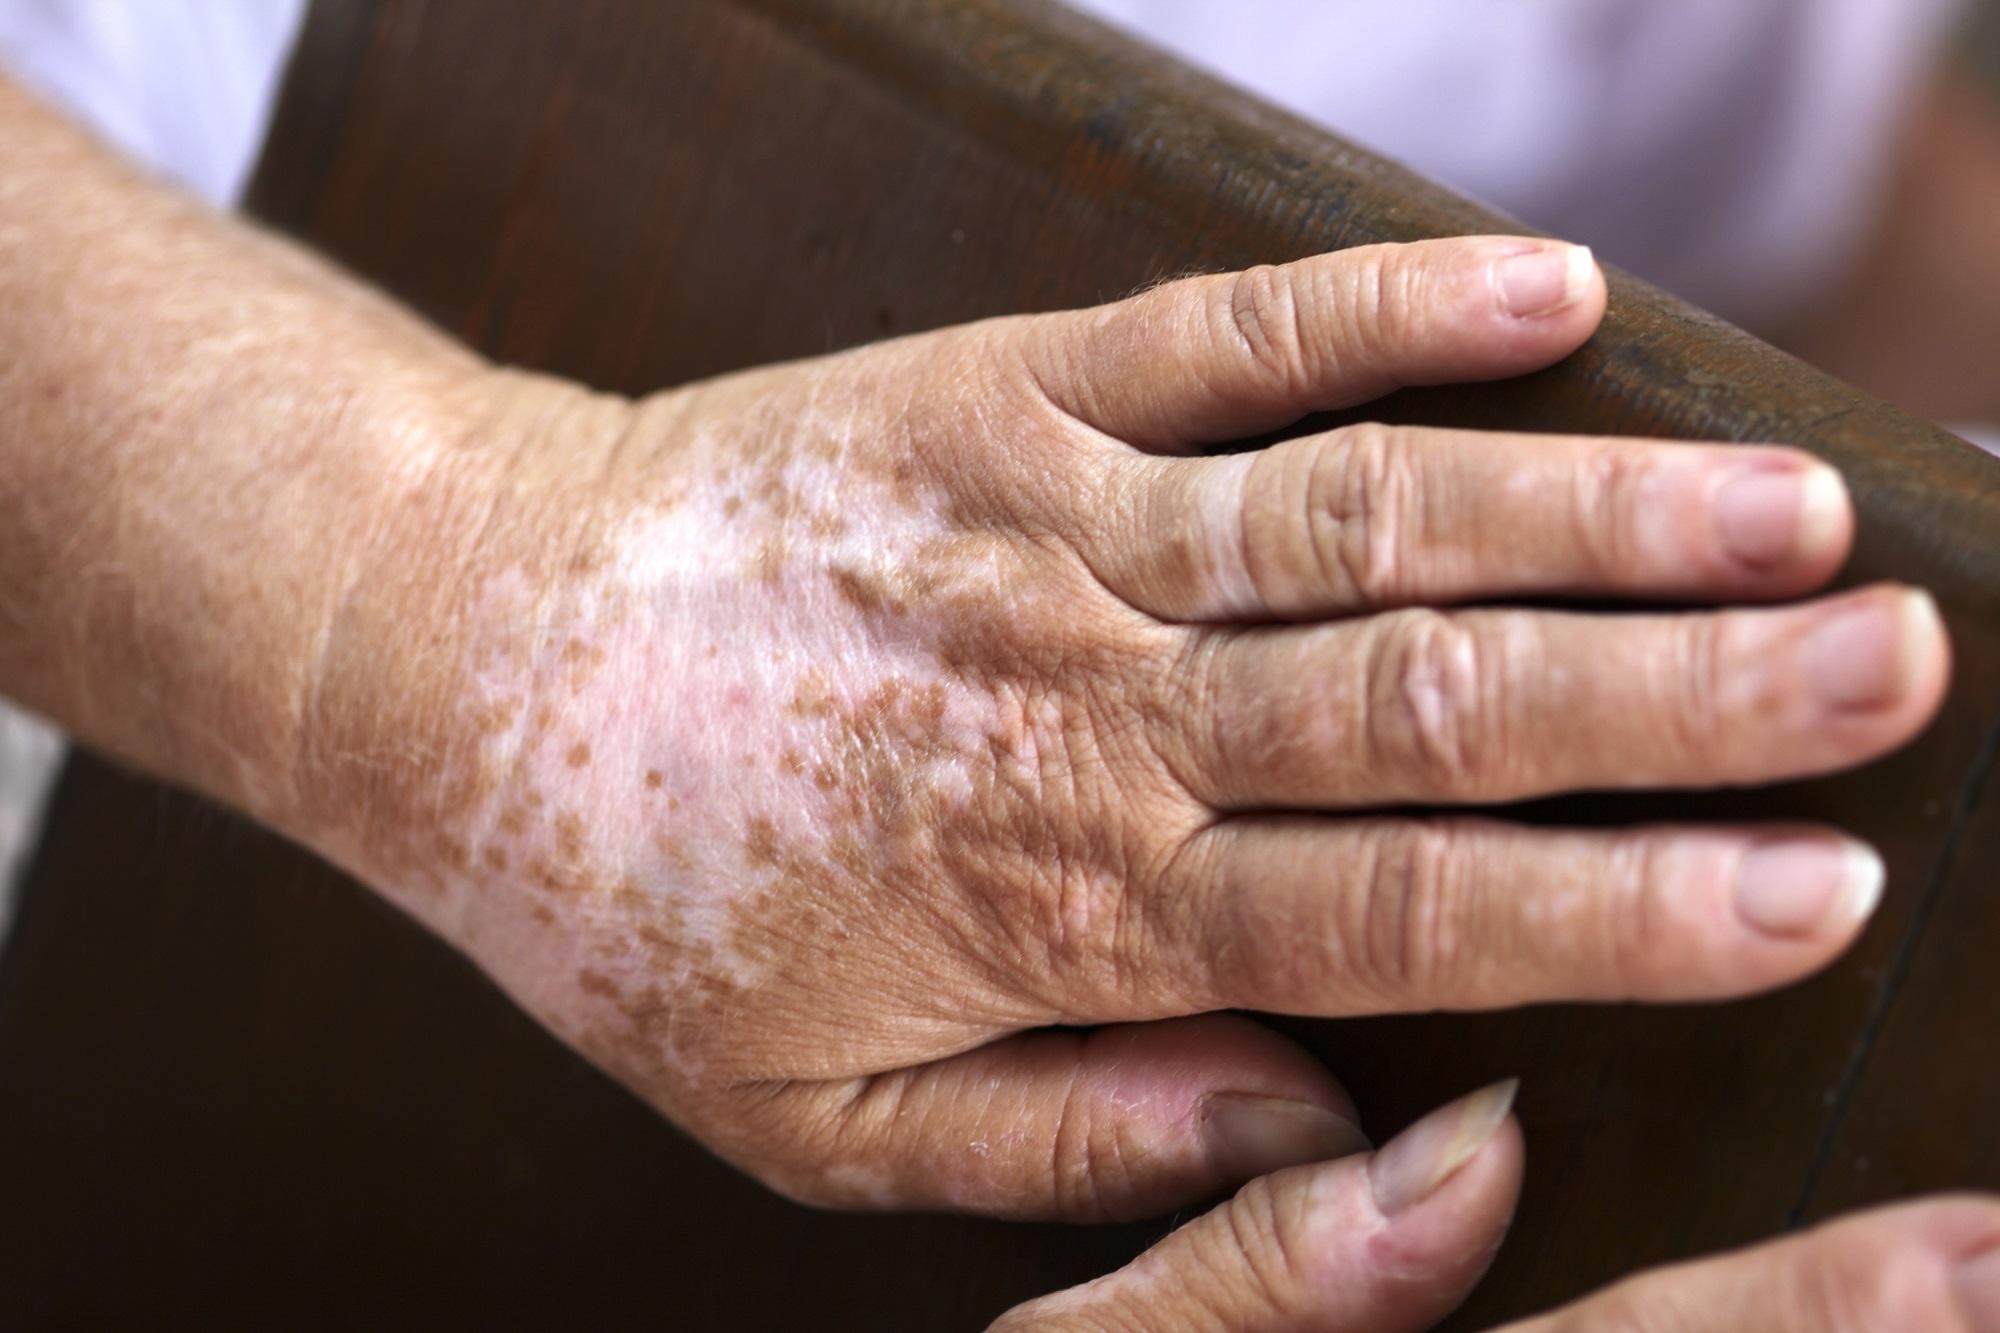 Immunomodulators Other Emerging Therapies Show Promise For Vitiligo Dermatology Advisor